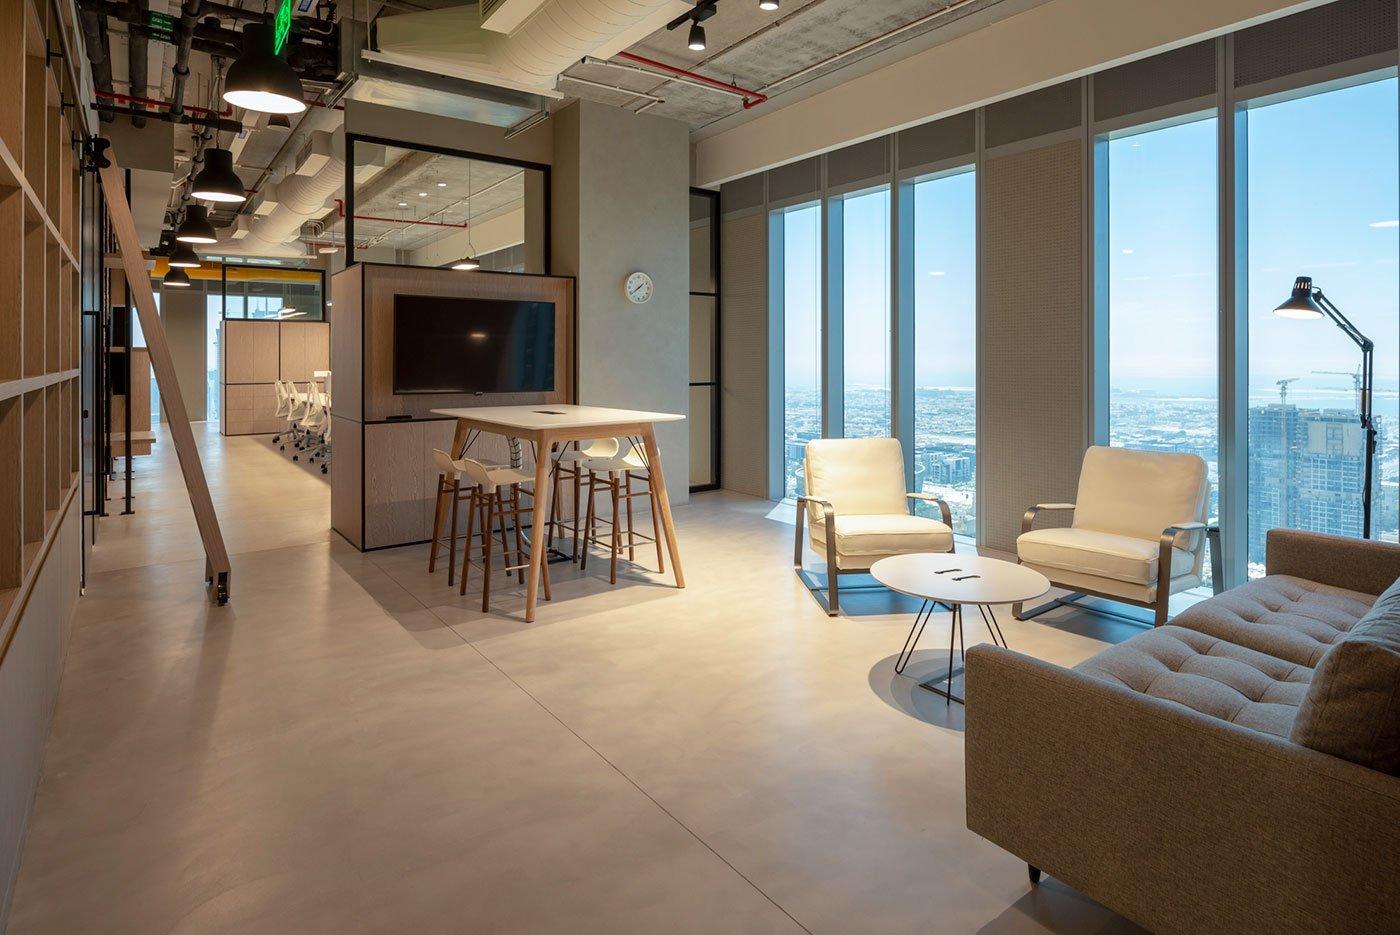 workspace interior photographer dubai